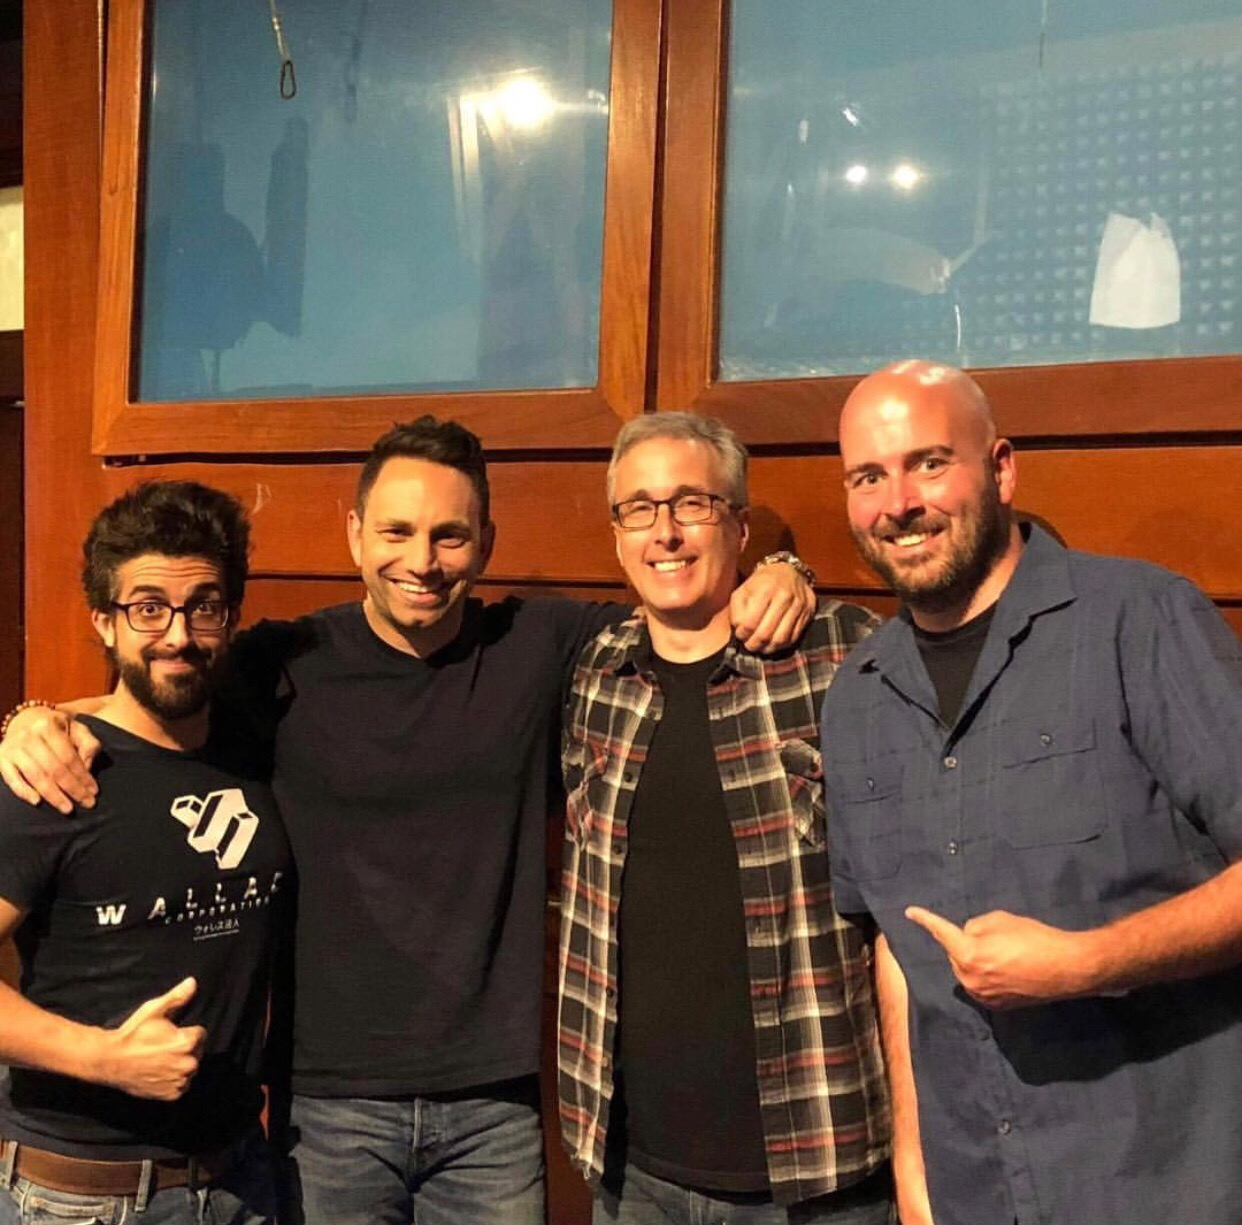 Kevin, Israel, Mike Morse, Ryan Maher!